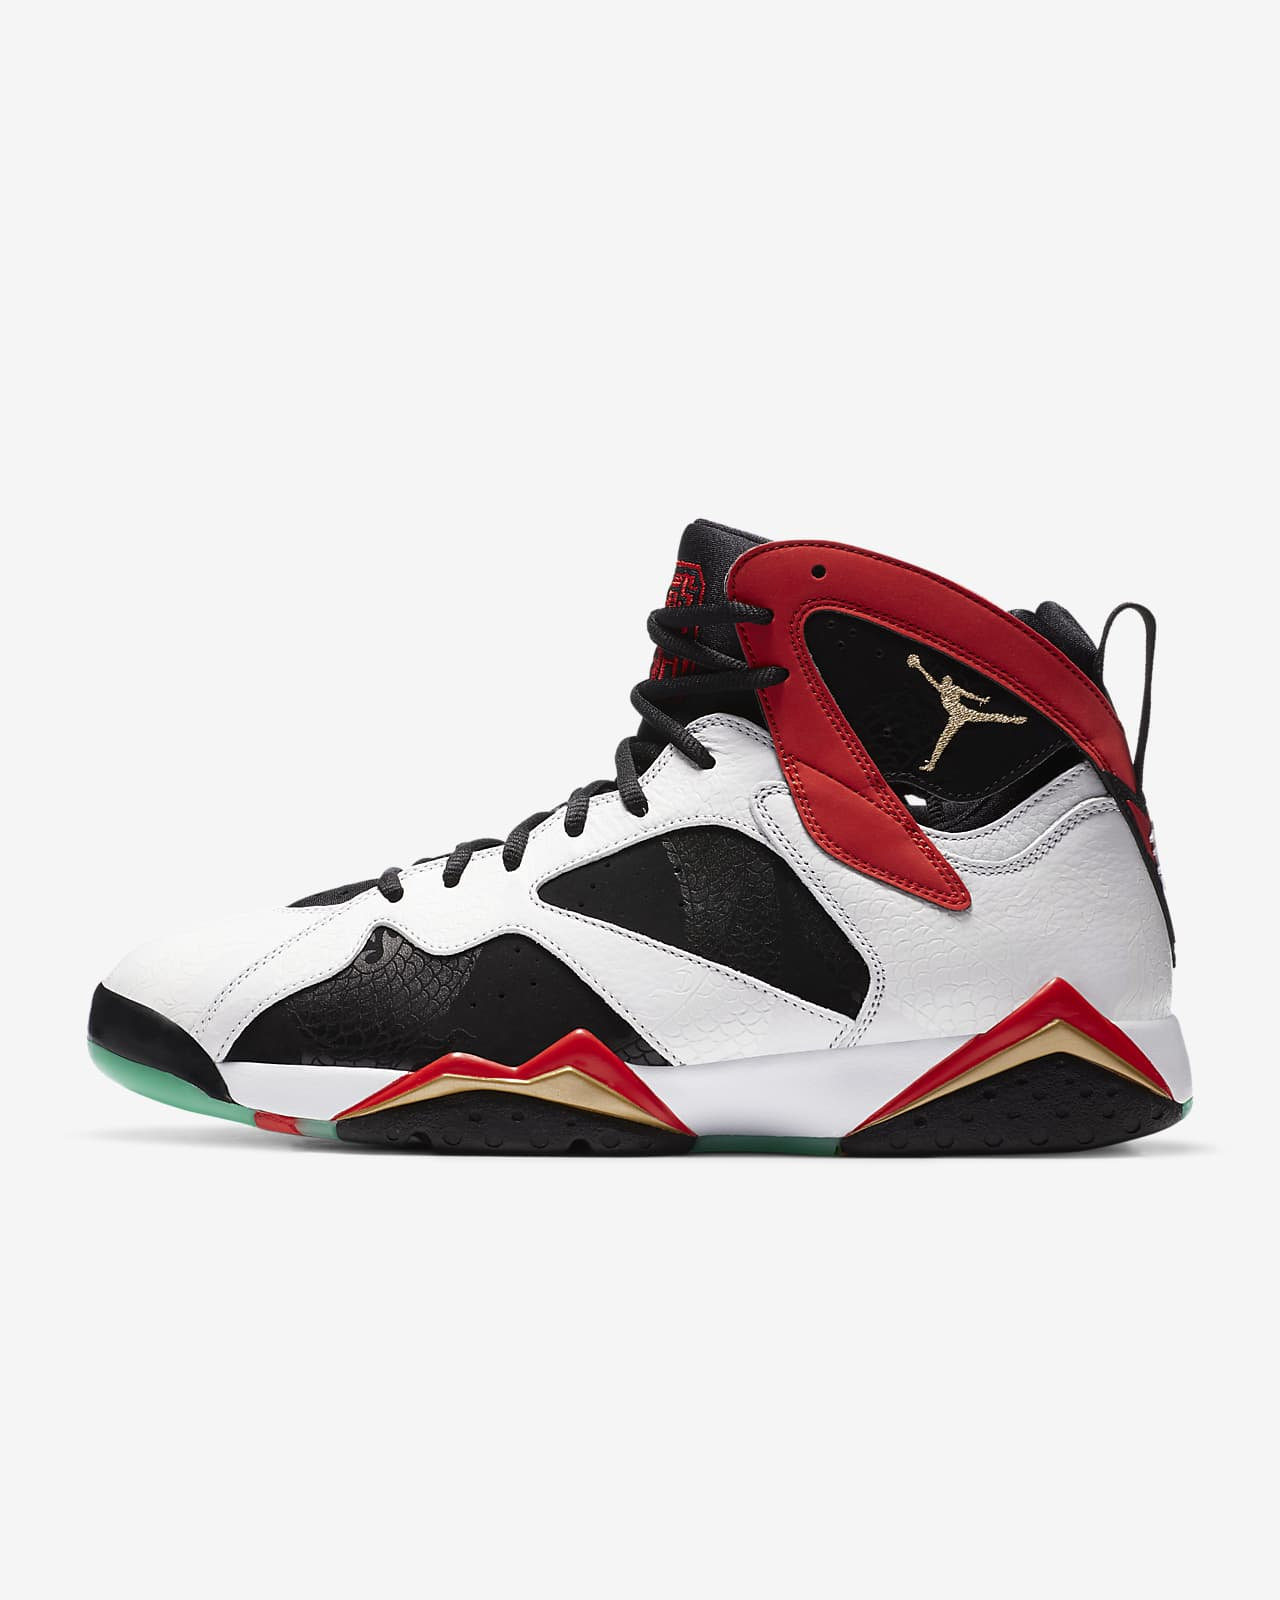 Air Jordan 7 Retro GC Men's Shoe